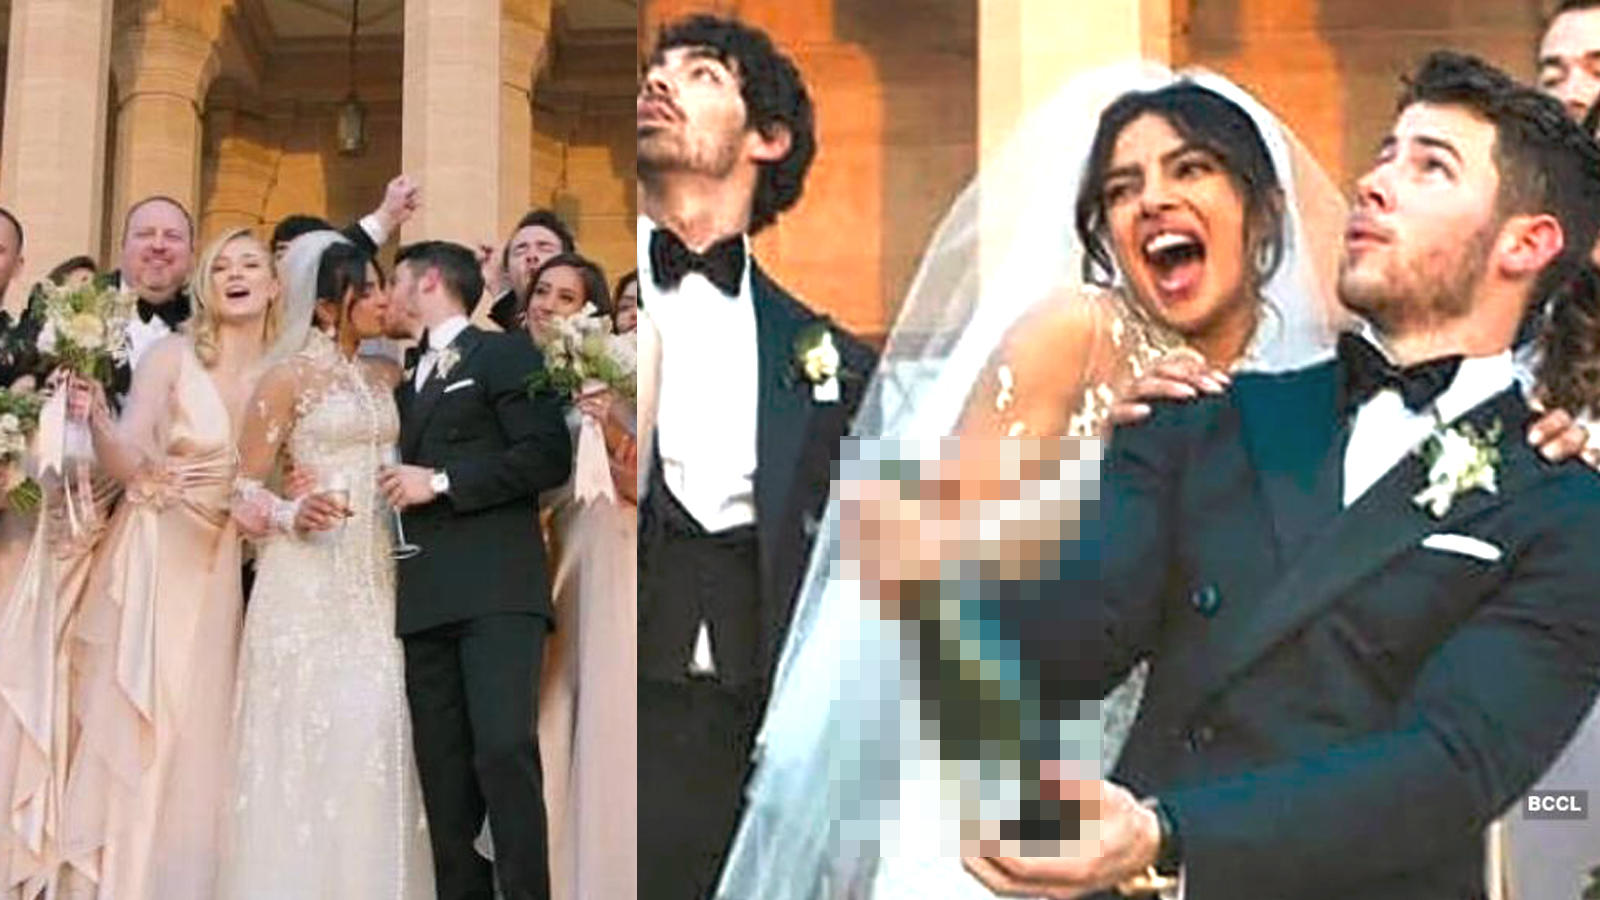 Revealed! Priyanka Chopra and Nick Jonas fell short of beer at their wedding